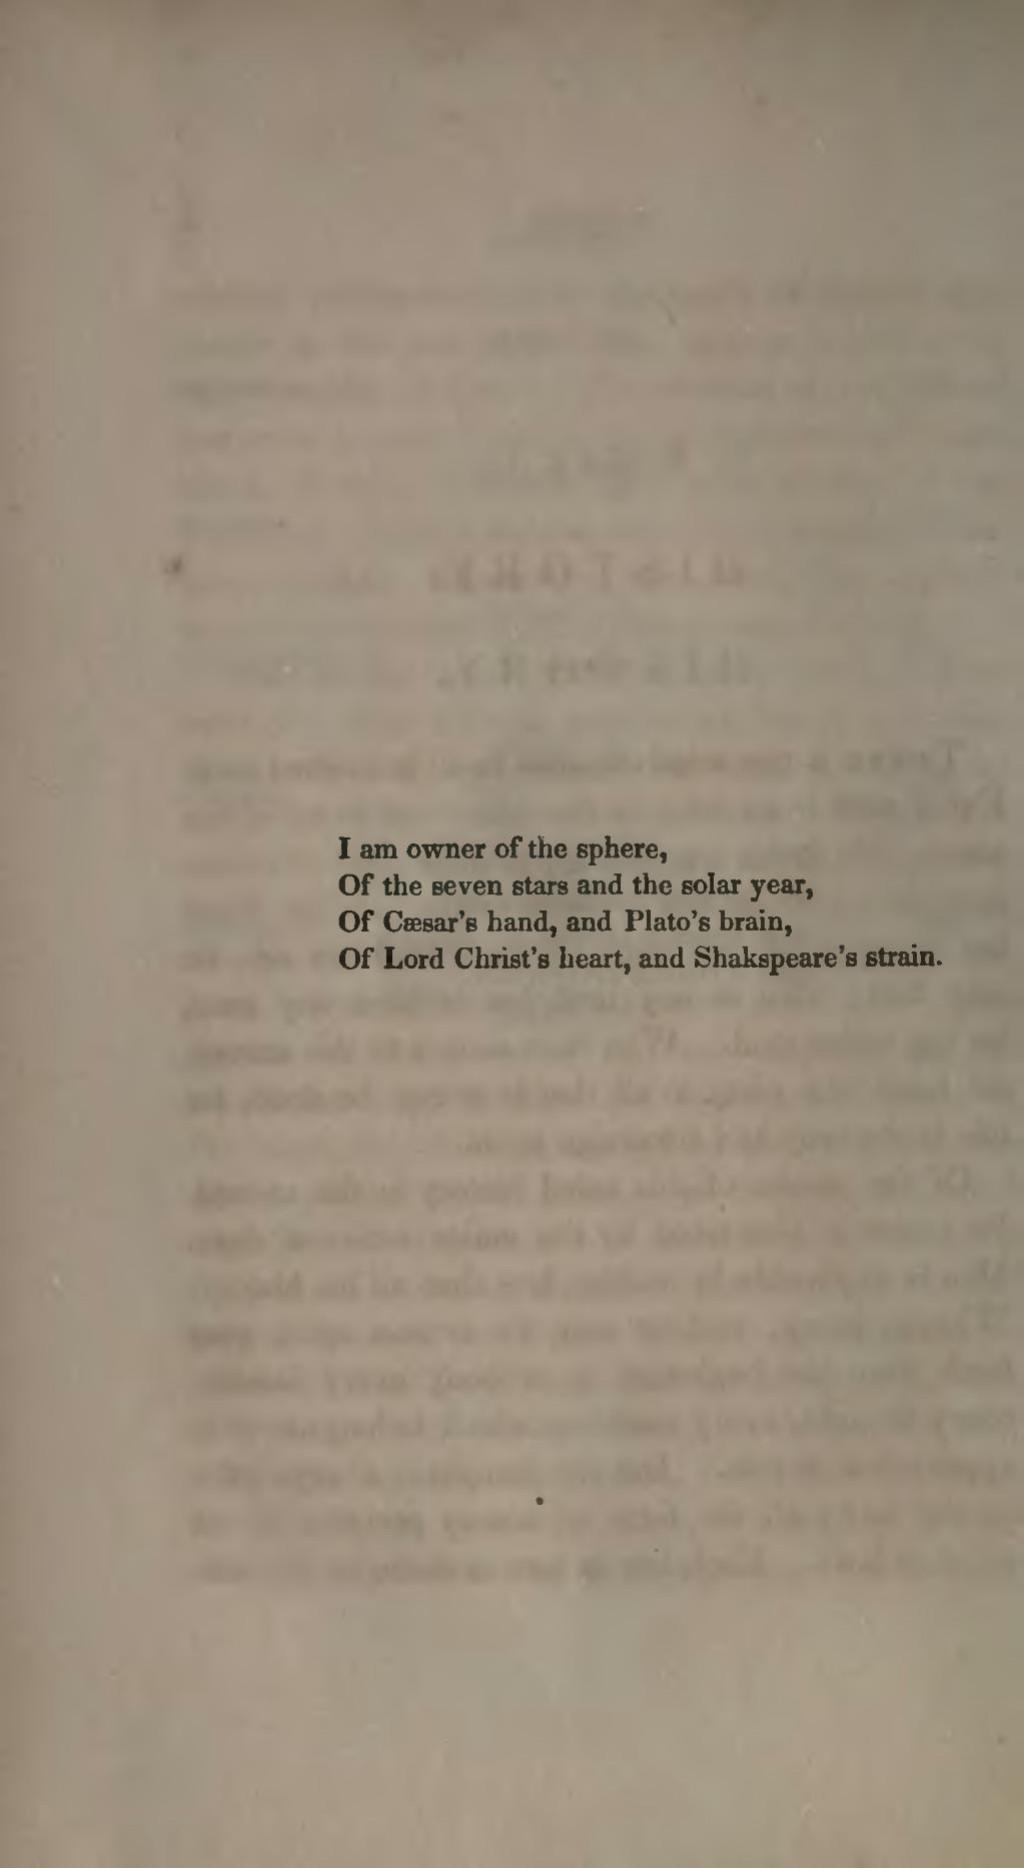 023 Essays First Series Page14 1024px Essays2c 28184729 Djvu Essay Stunning Emerson Pdf Shelburne Publisher Large